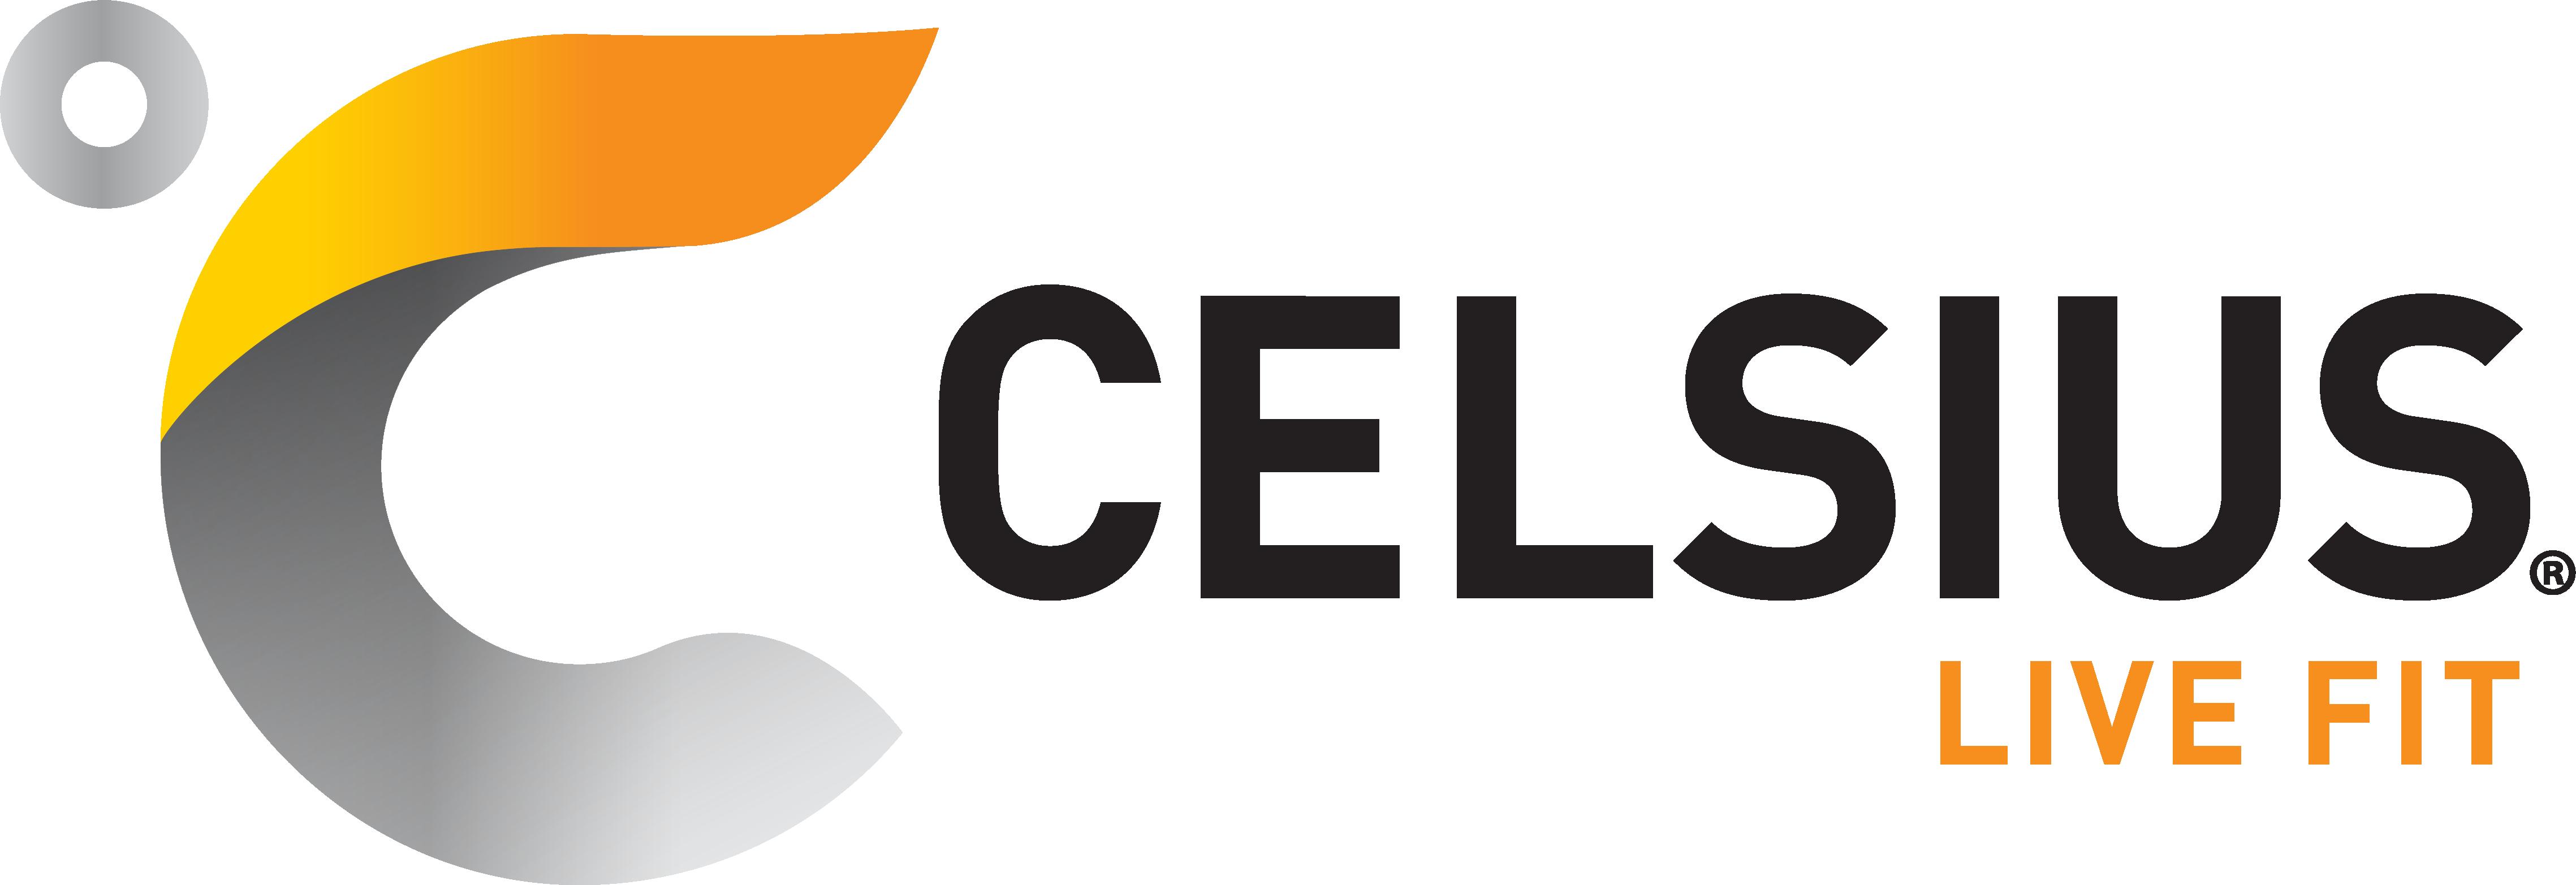 Celsius logotyp